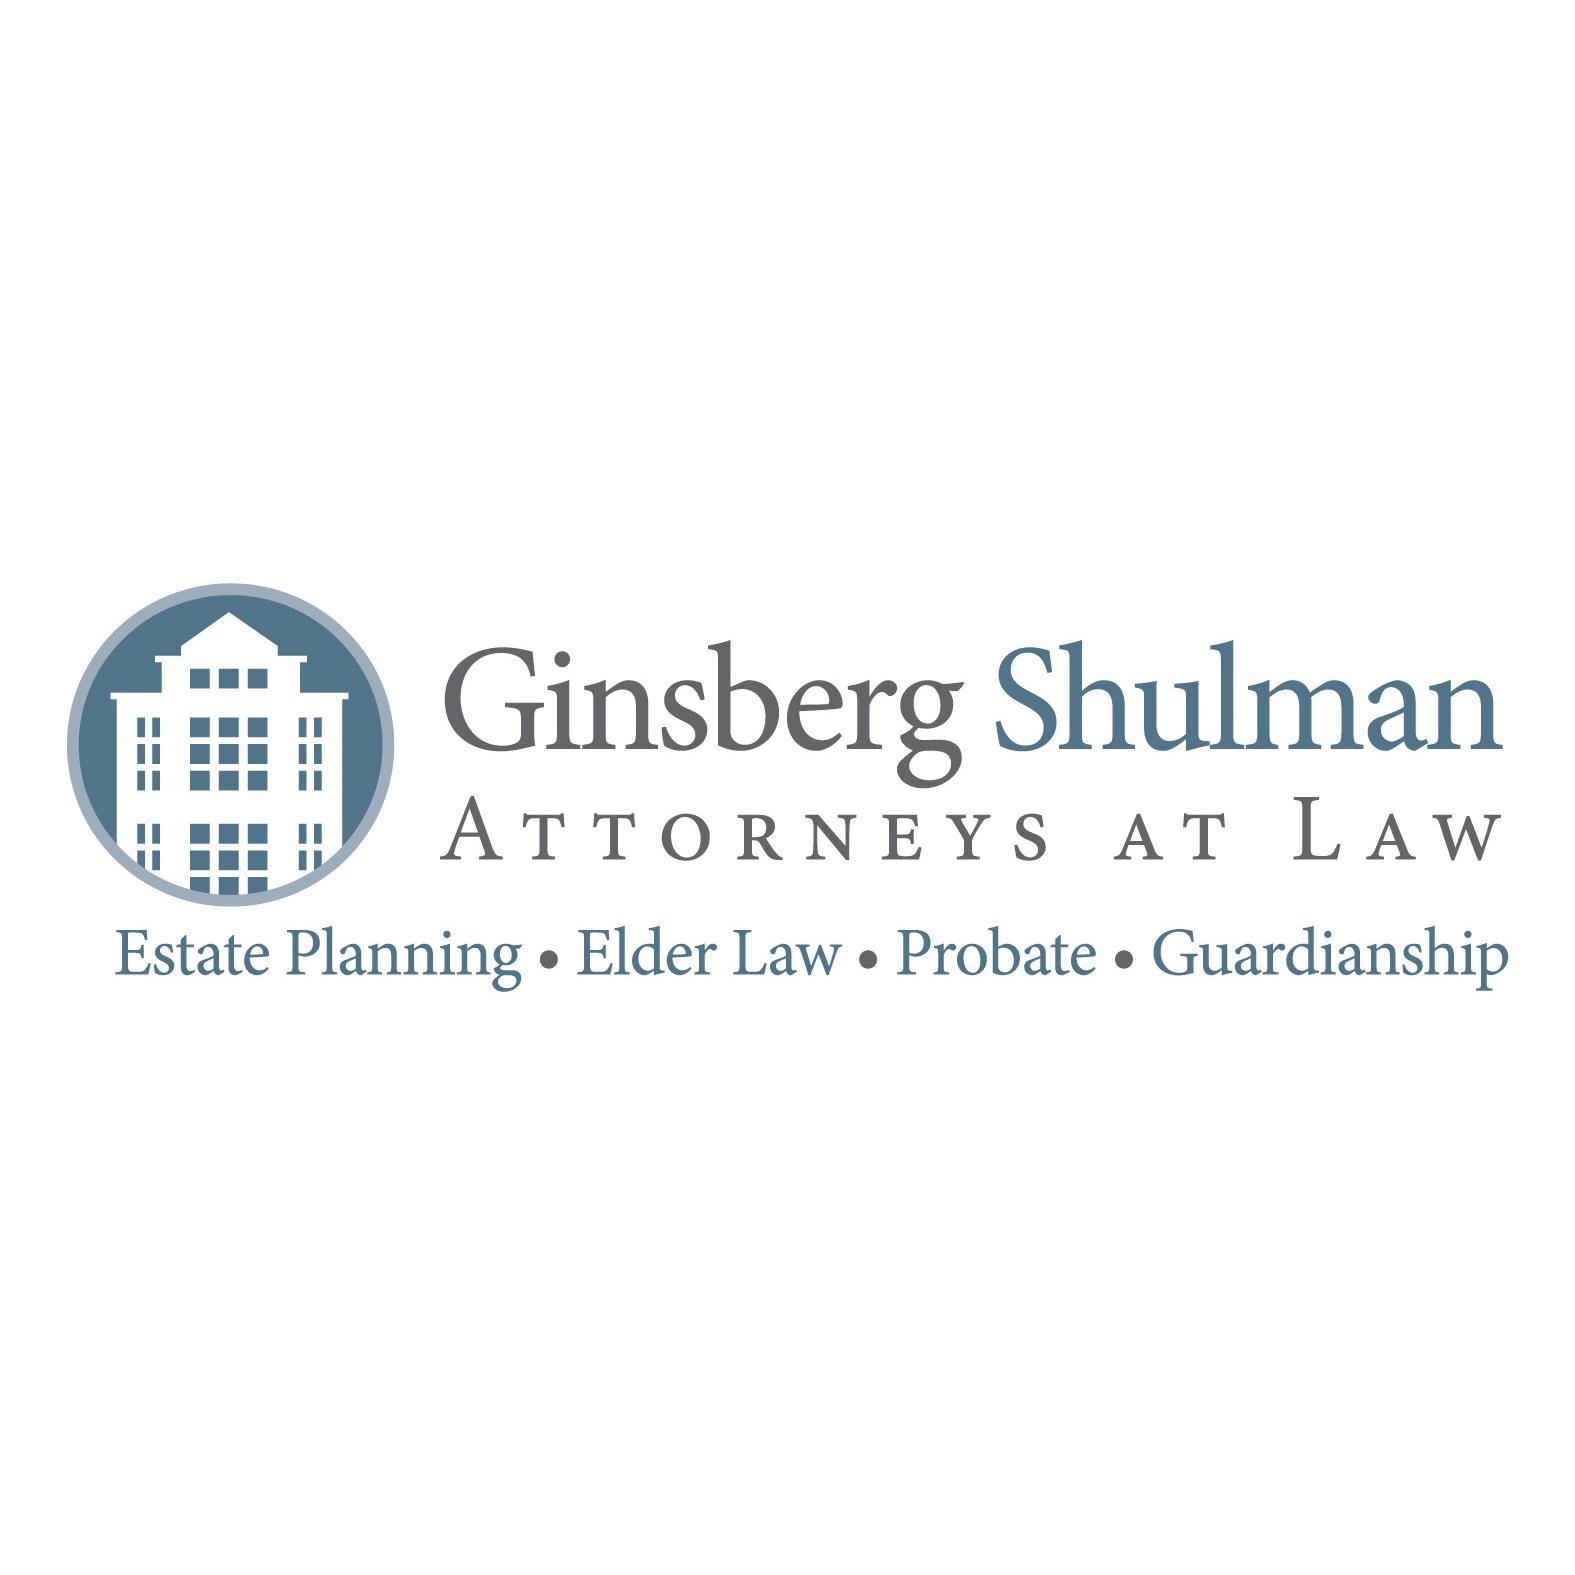 Ginsberg Shulman, PL